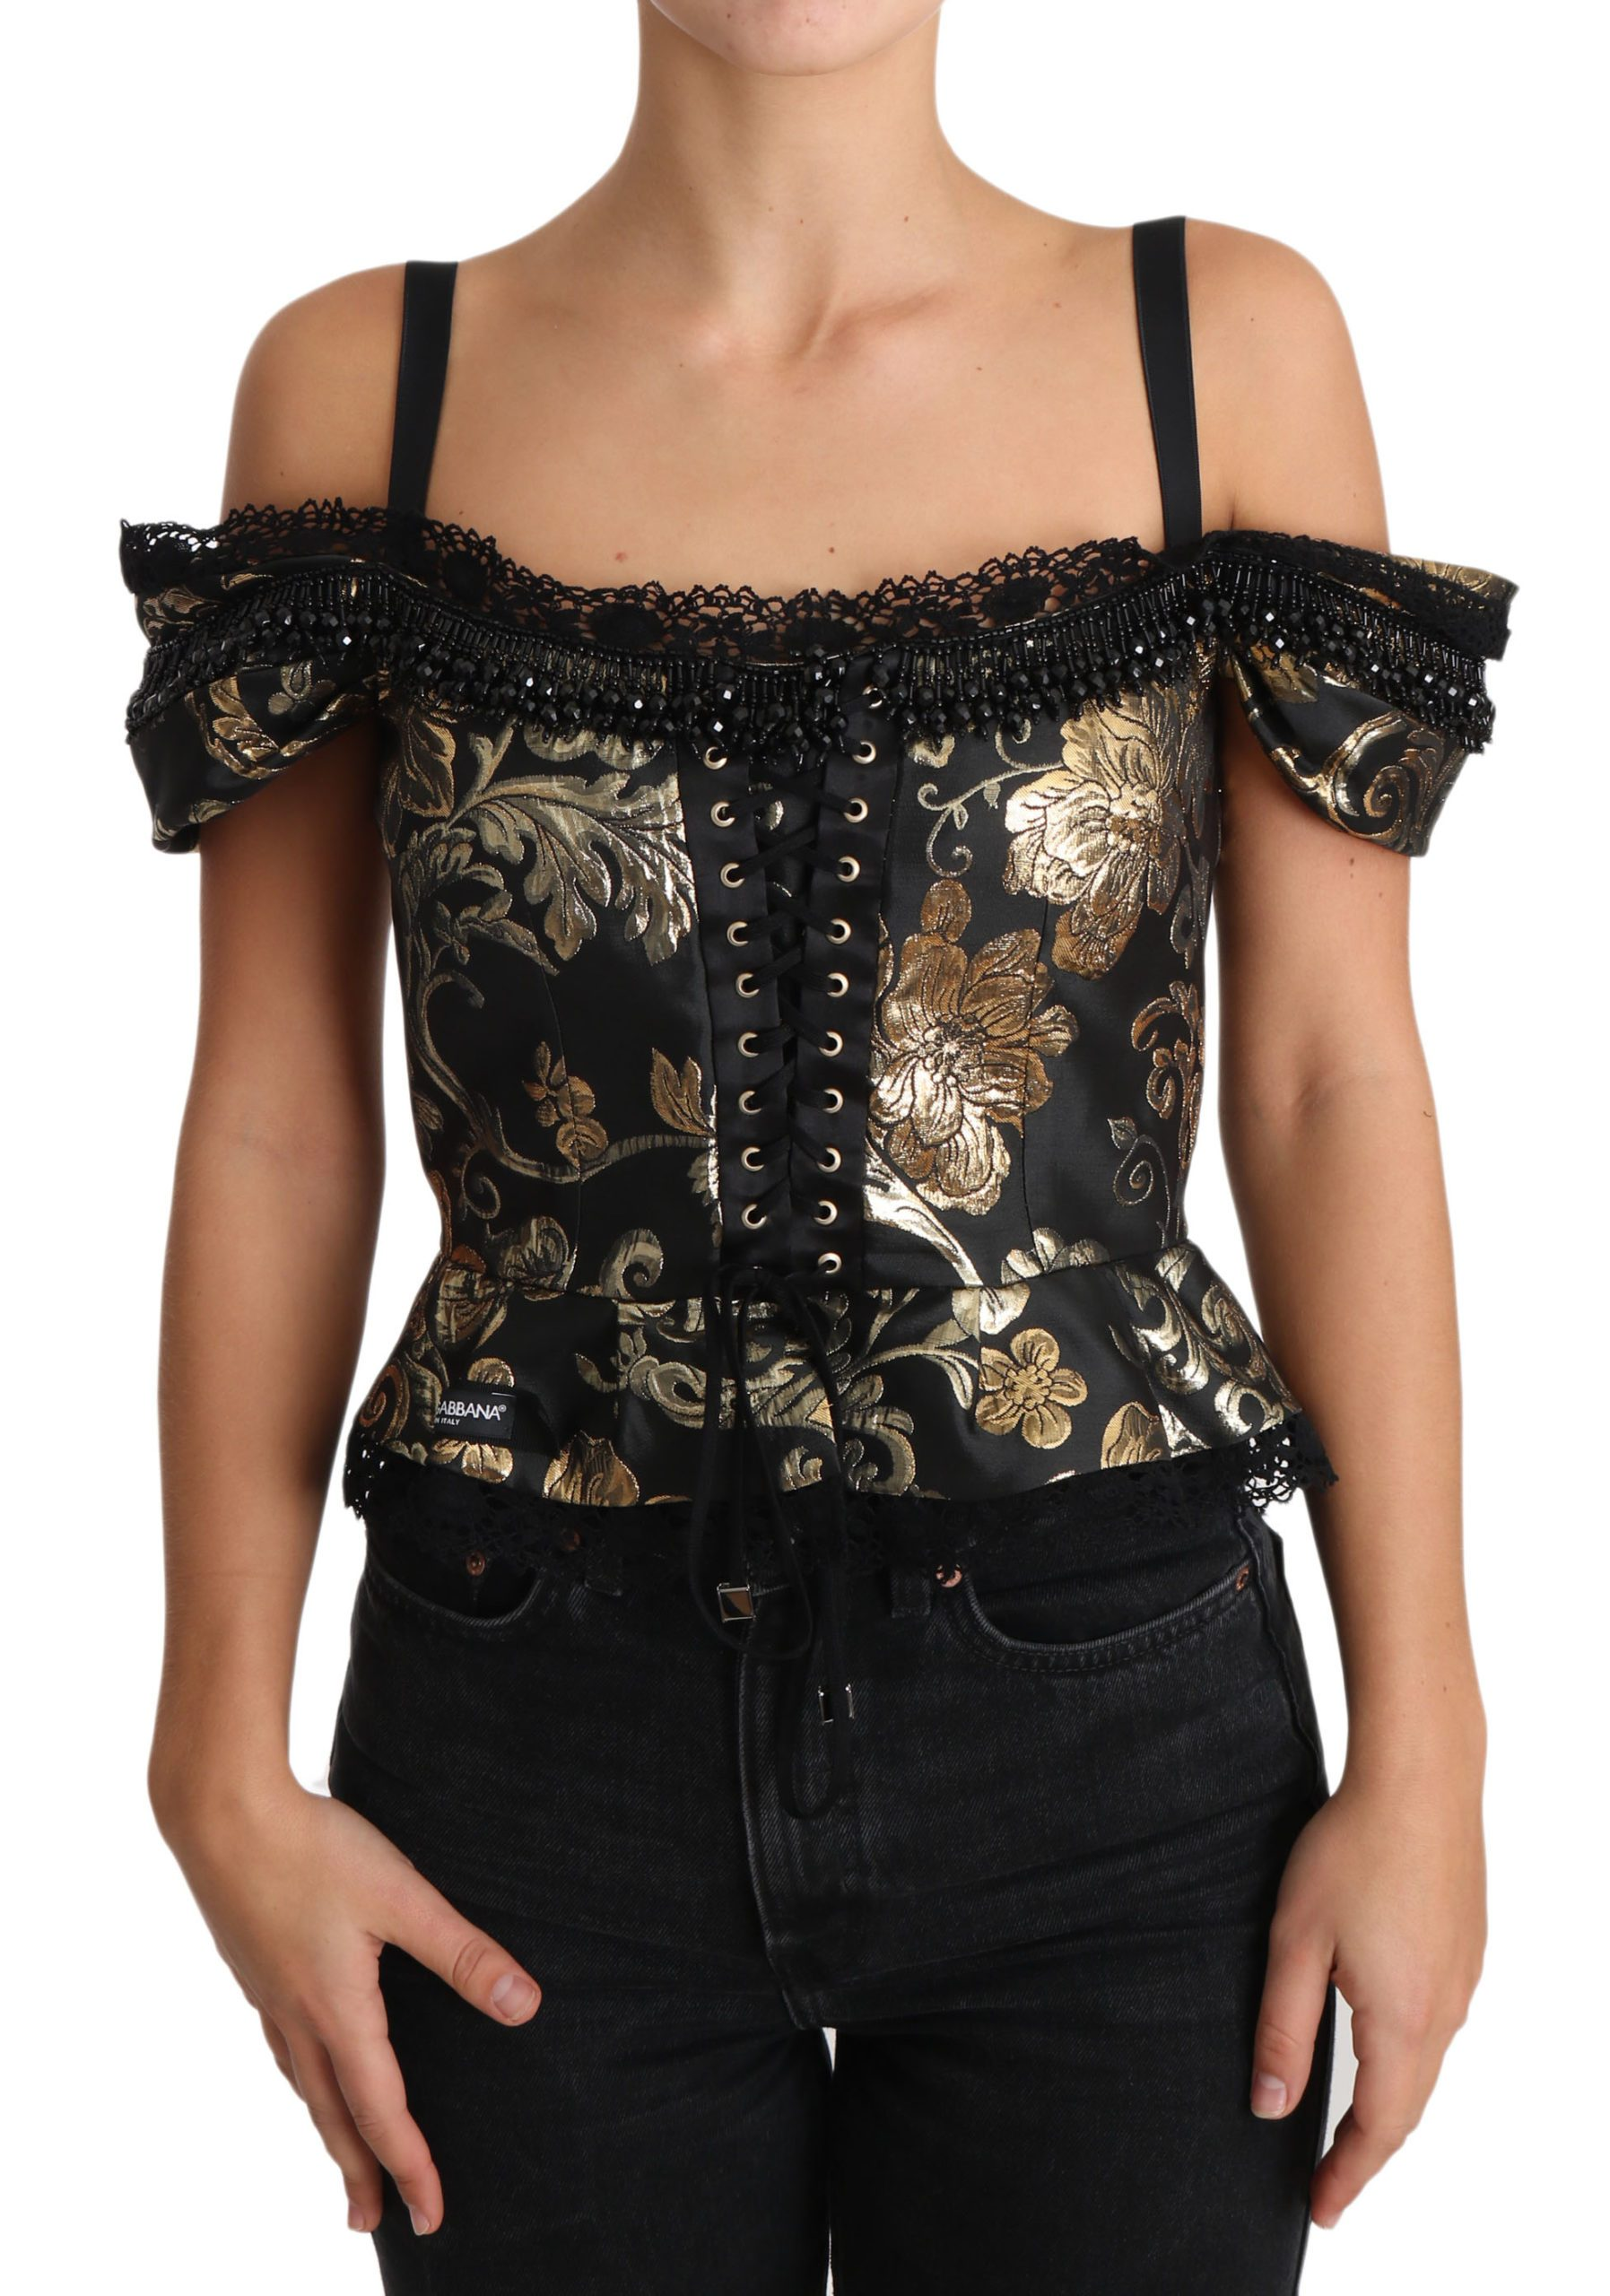 Dolce & Gabbana Women's Floral Jacquard Crystal Top Black TSH3381 - IT36 | XS